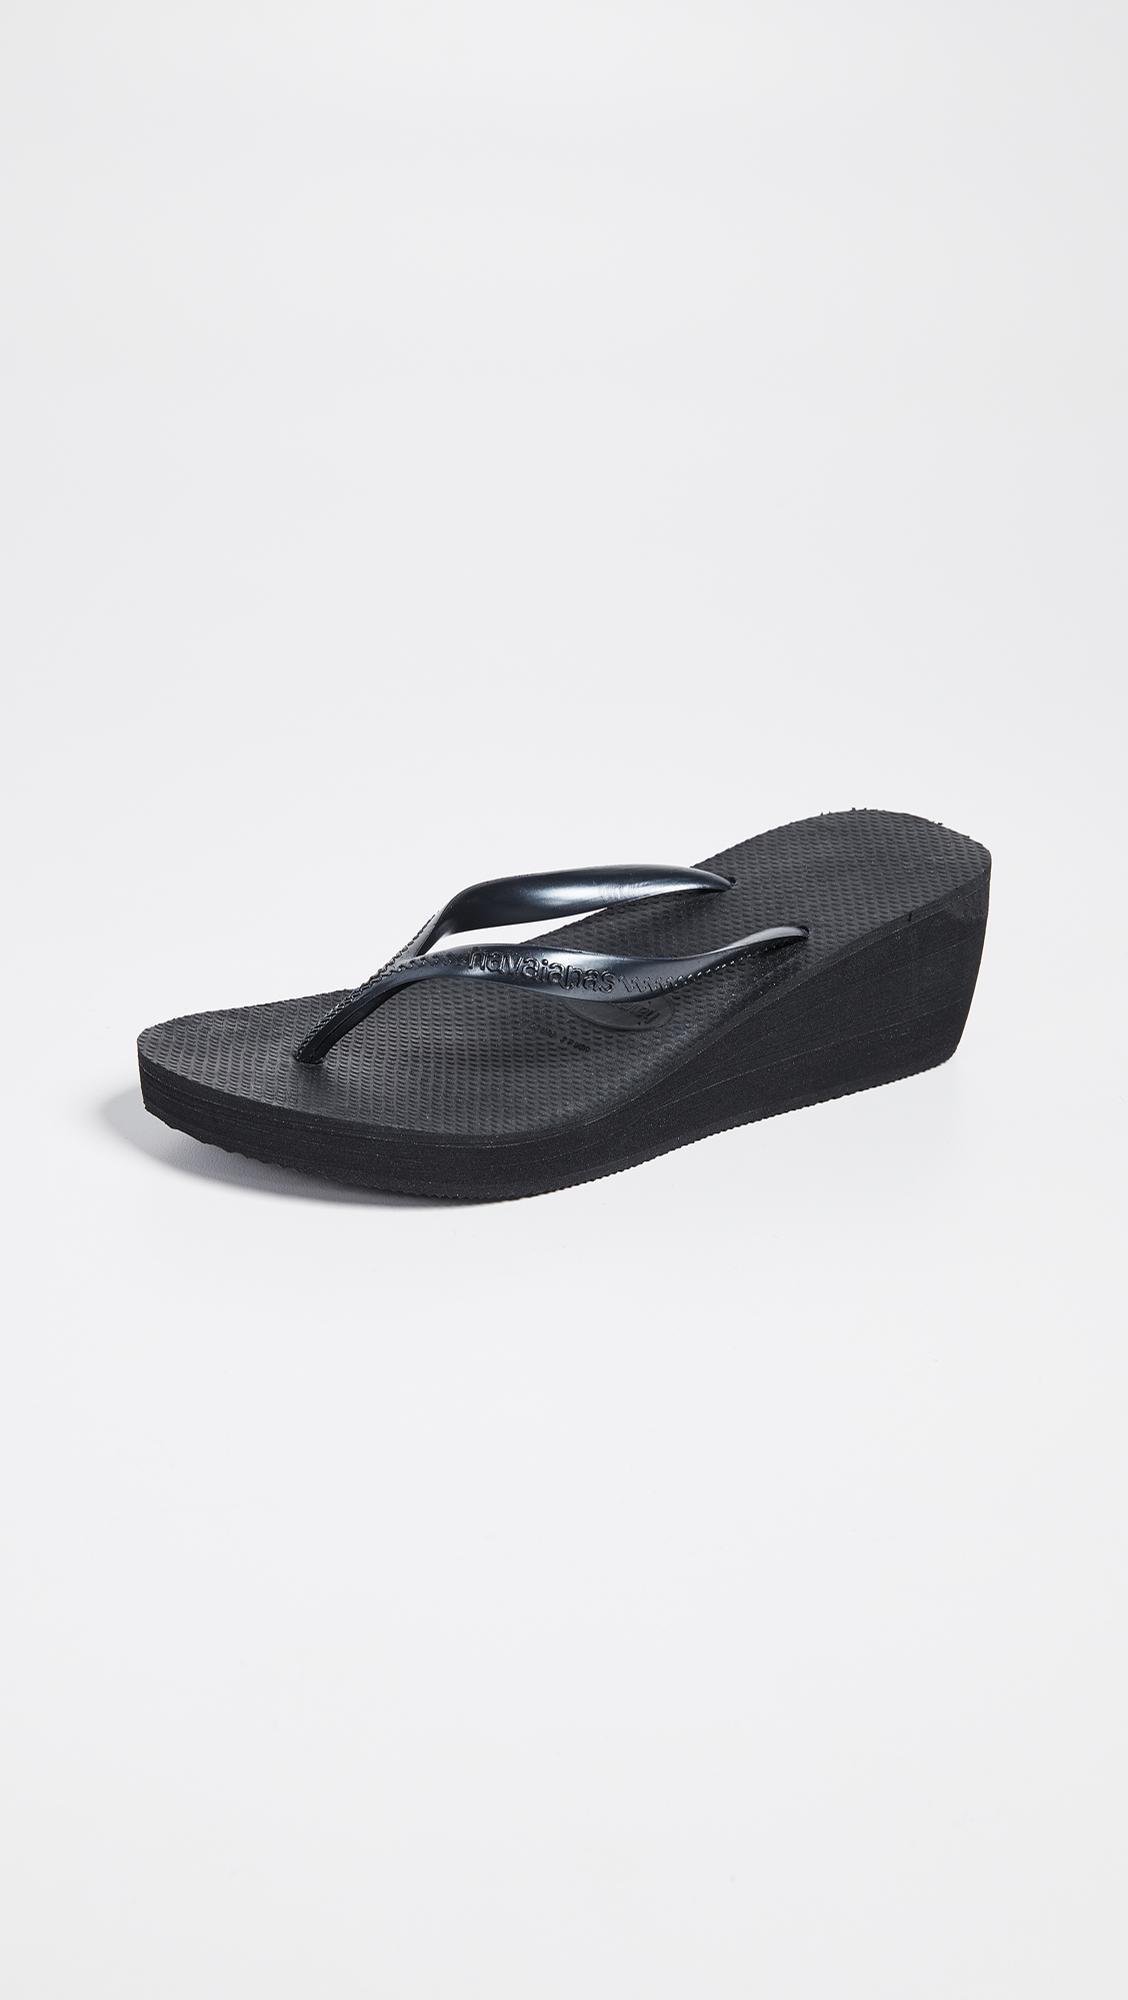 Havaianas High Fashion Wedge Flip Flops In Metallic - Lyst-5277